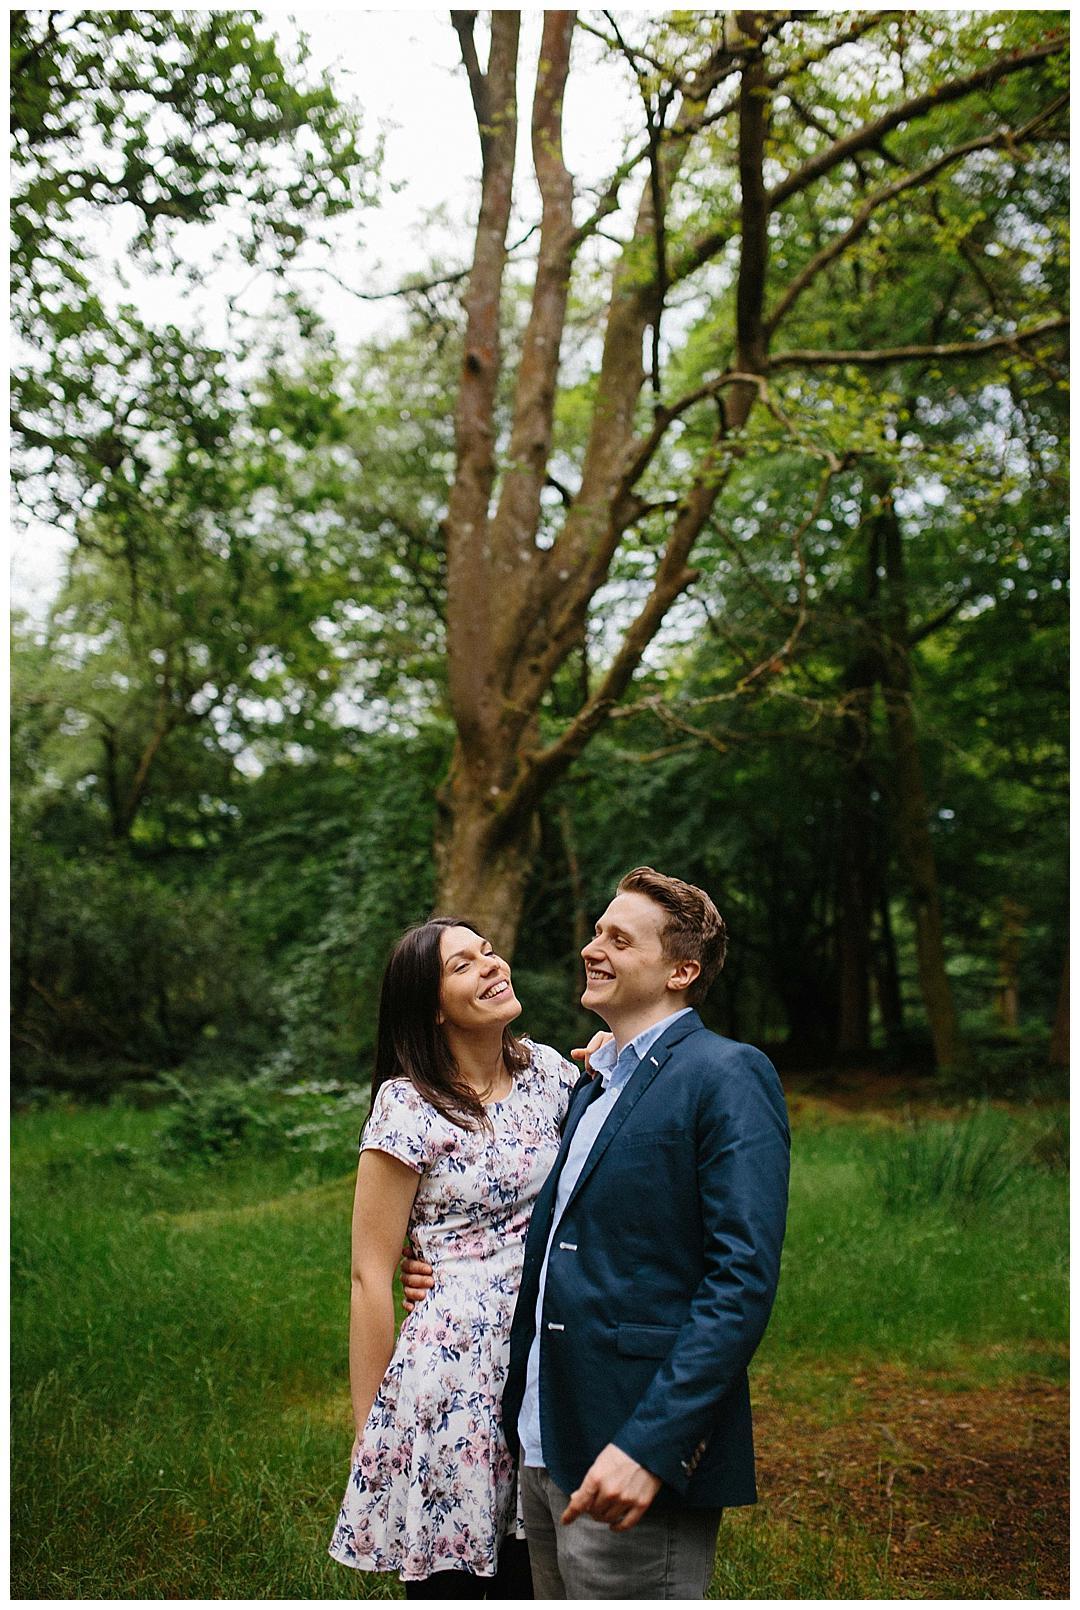 We_can _be_Heroes_alternative_wedding_photographer_Ireland_0047